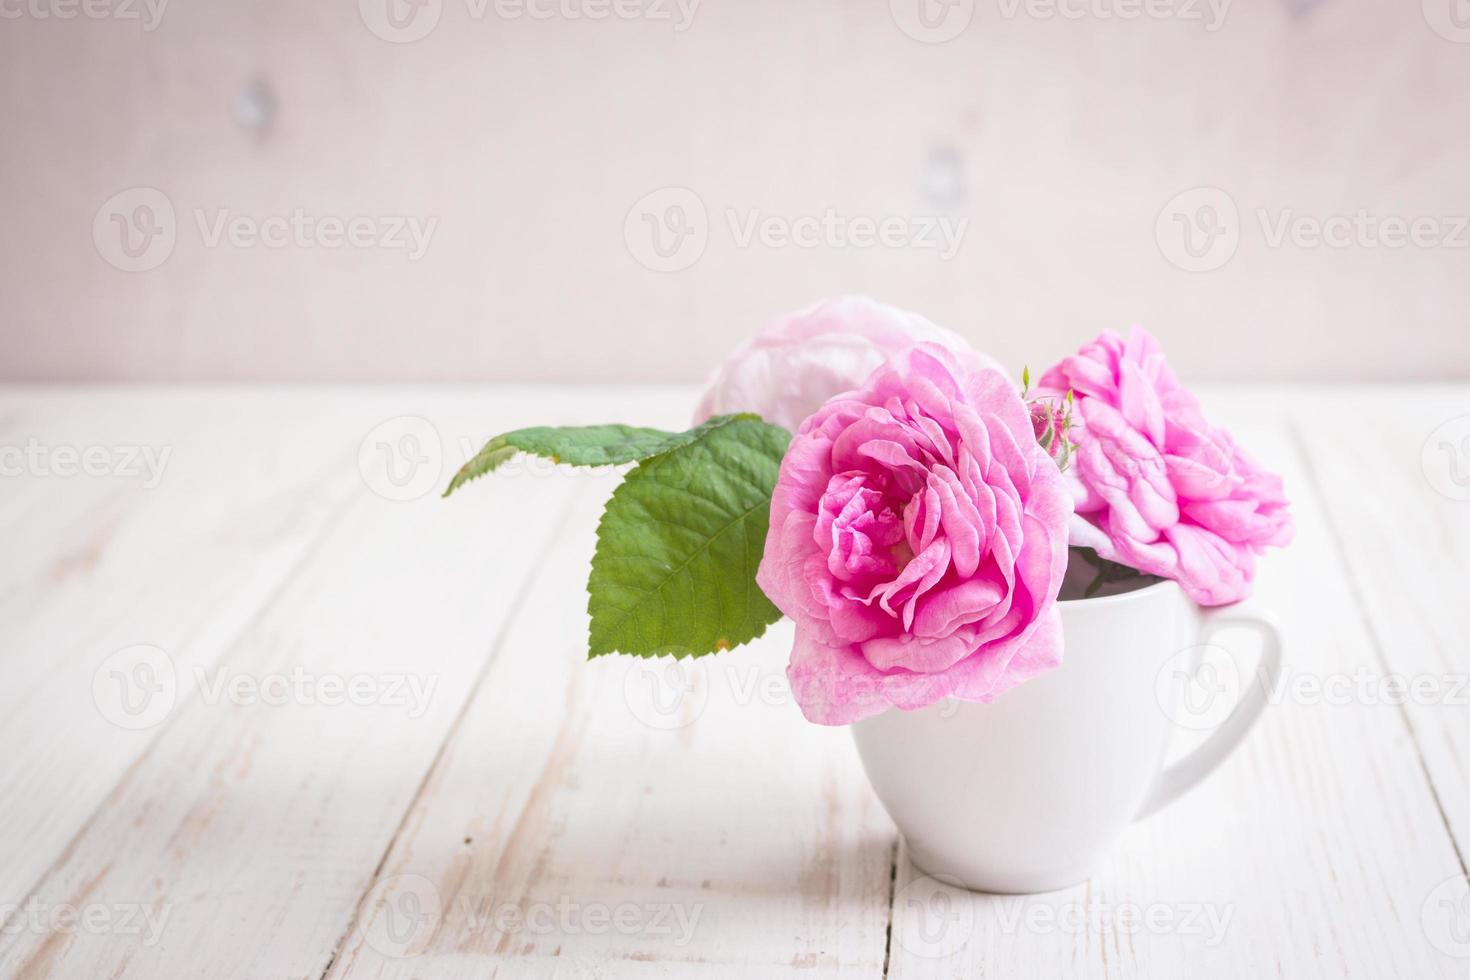 rose da tè rosa su un fondo di legno bianco foto